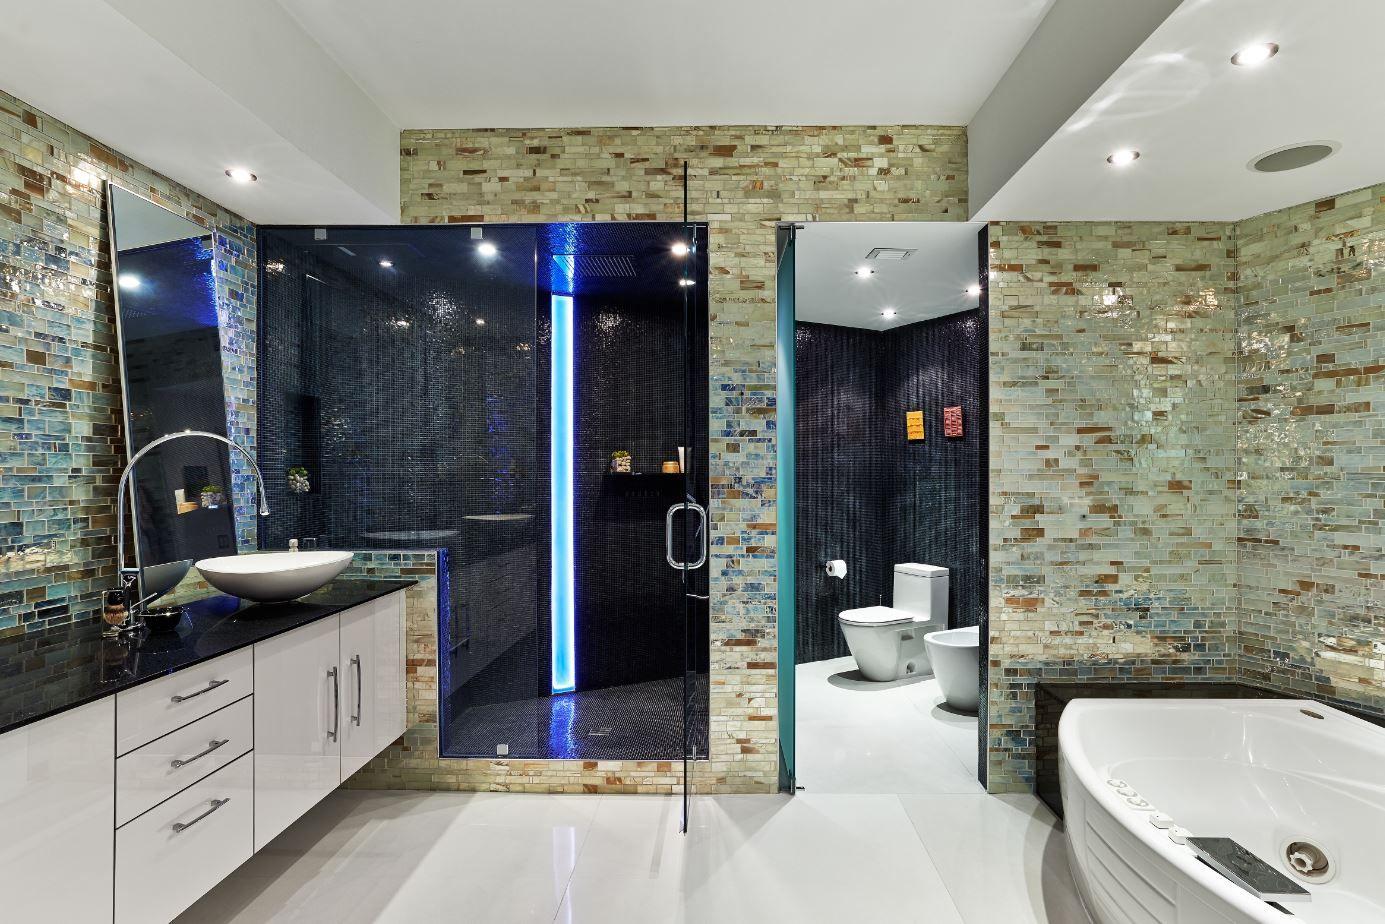 This Stunning Miami Apartment Was Transformed Using Kitchen Trend Surface Polar Ice For The Countertop Backsplash Enhanc Bathroom Bathroom Renovations Bathroom Trends